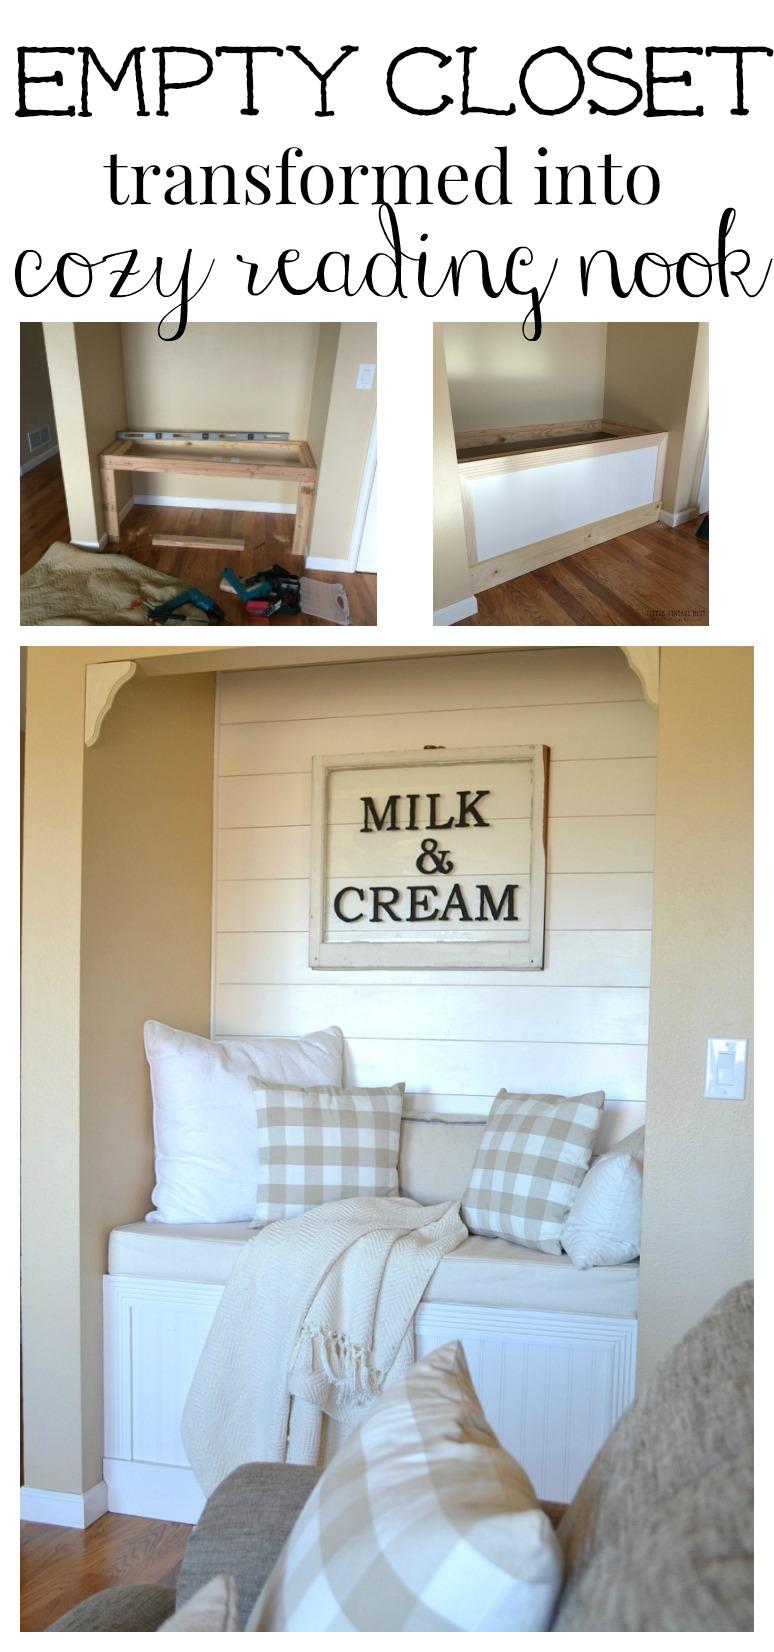 Empty Closet Transformed into Cozy Reading Nook in Farmhouse Style Living Room. Brilliant DIY project!